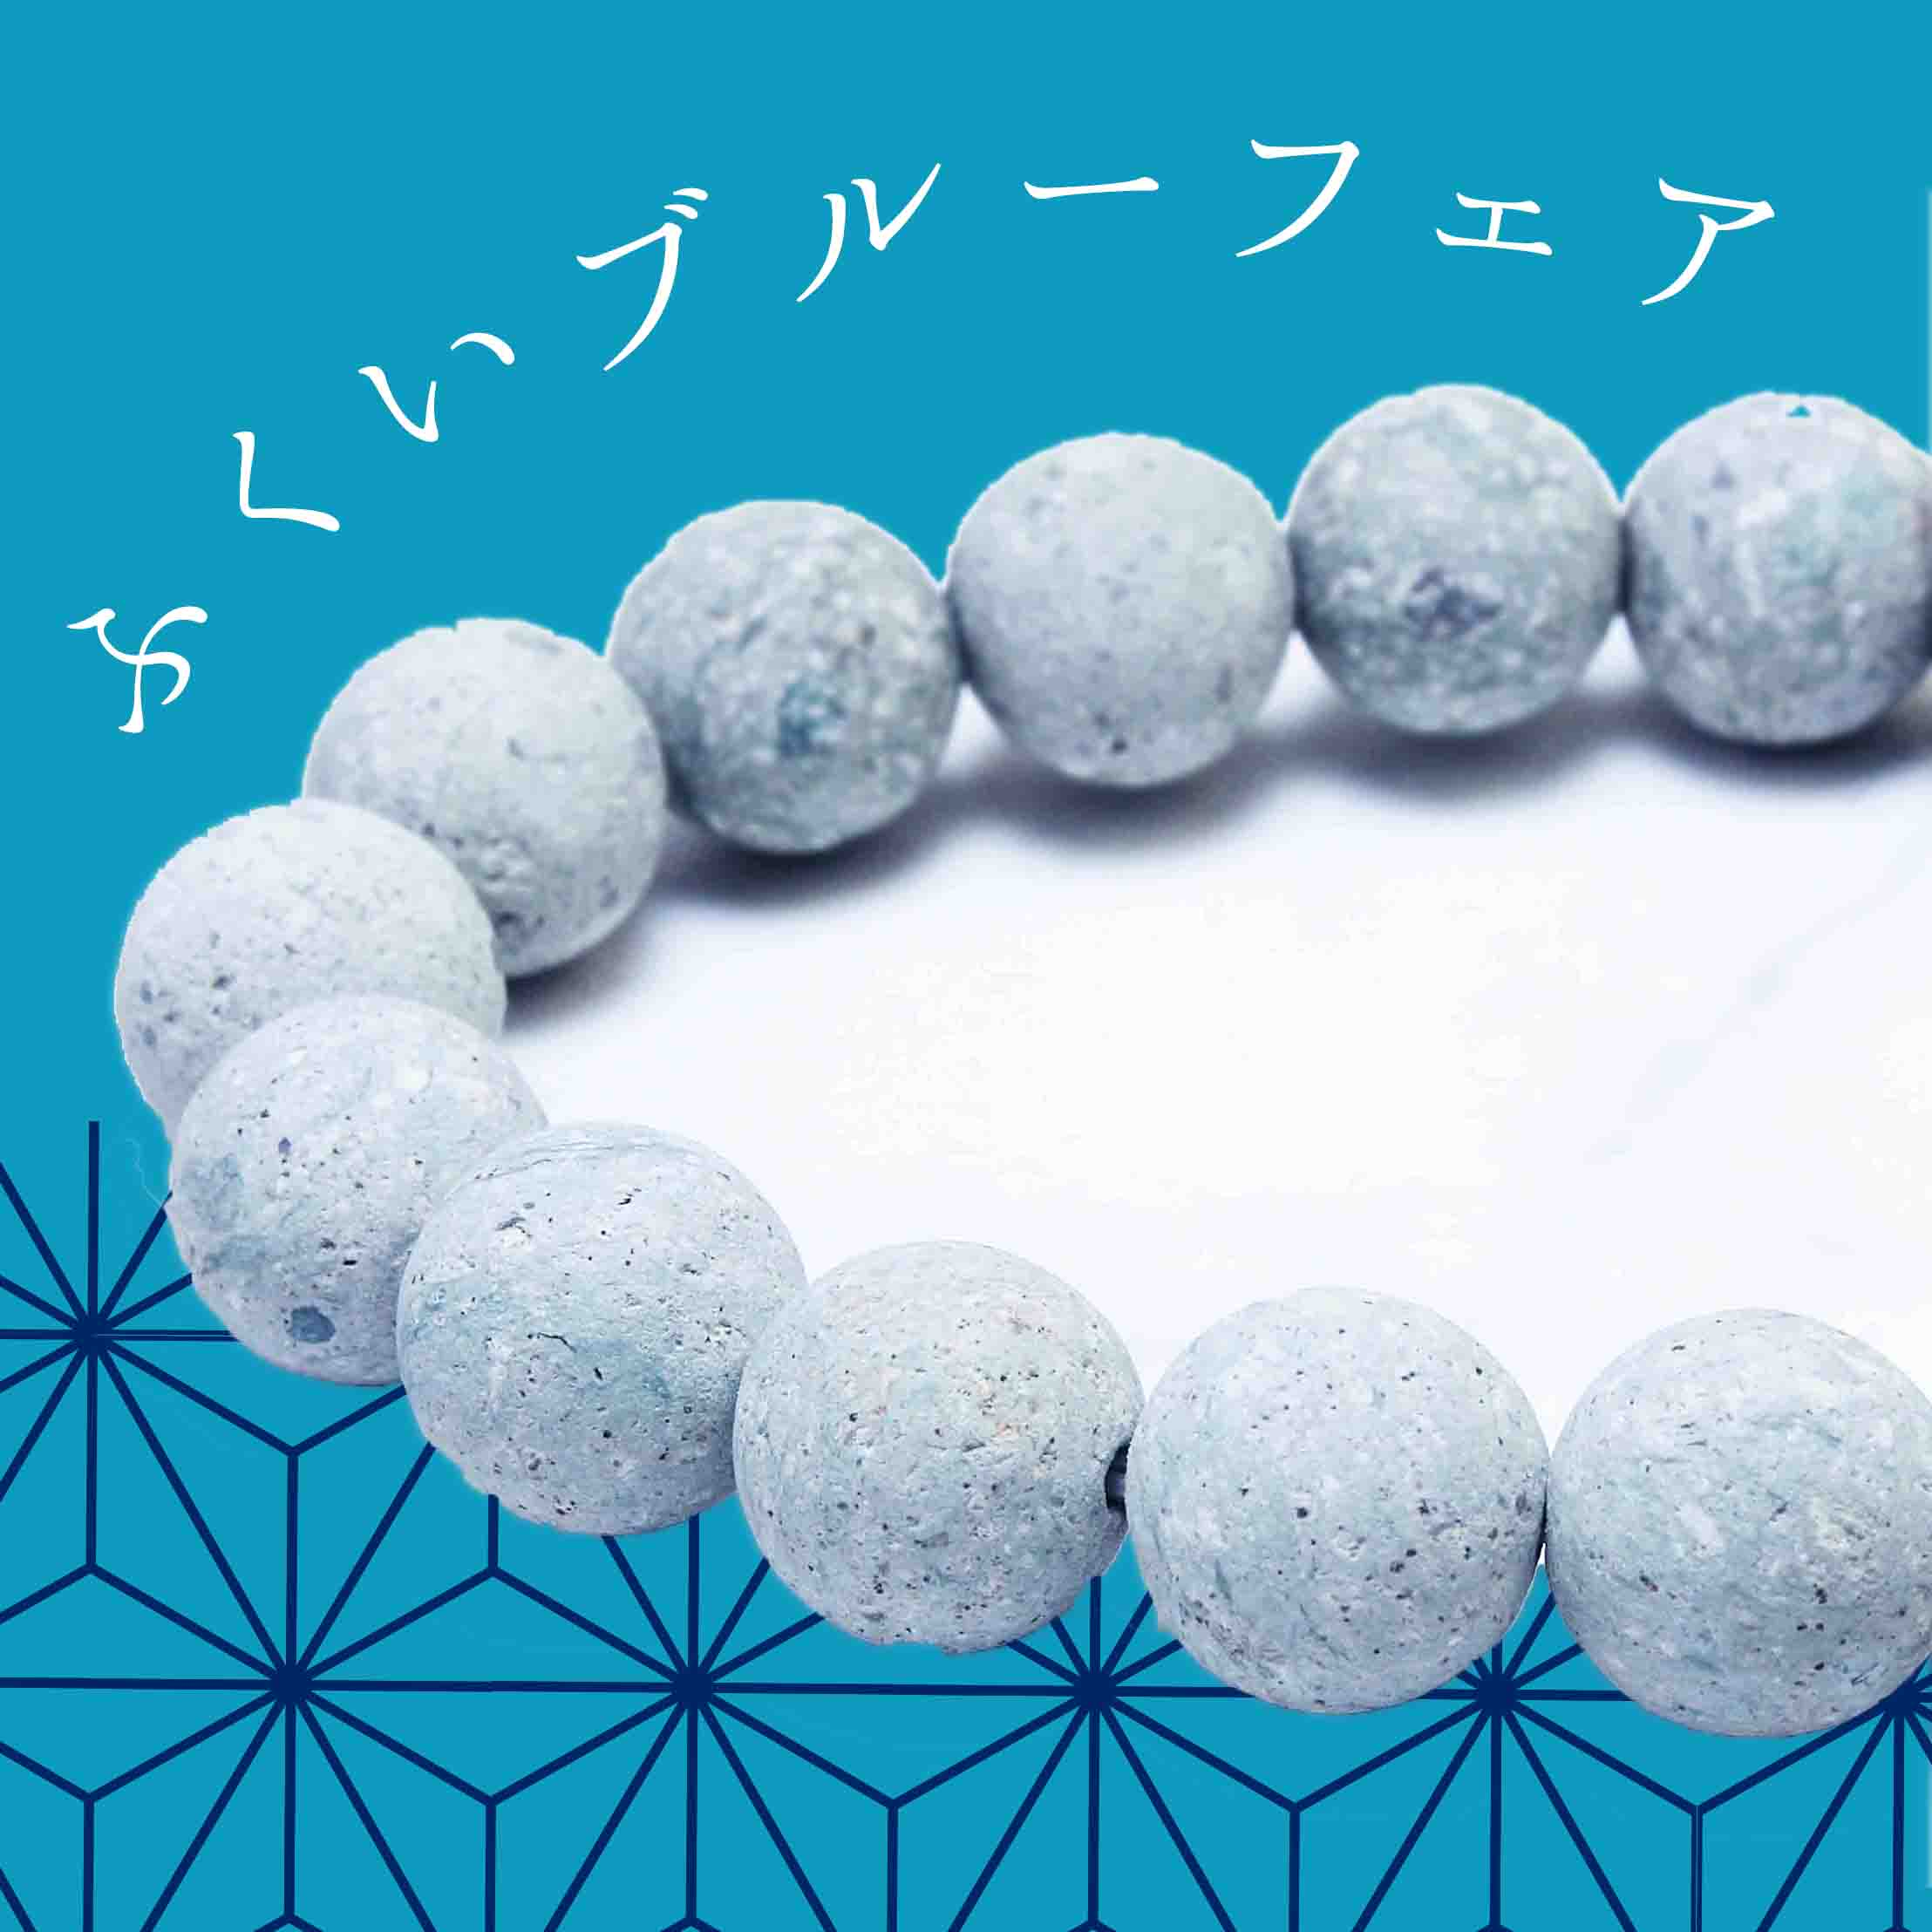 https://www.stoneclub.jp/data/stoneclub/image/6423646.jpg